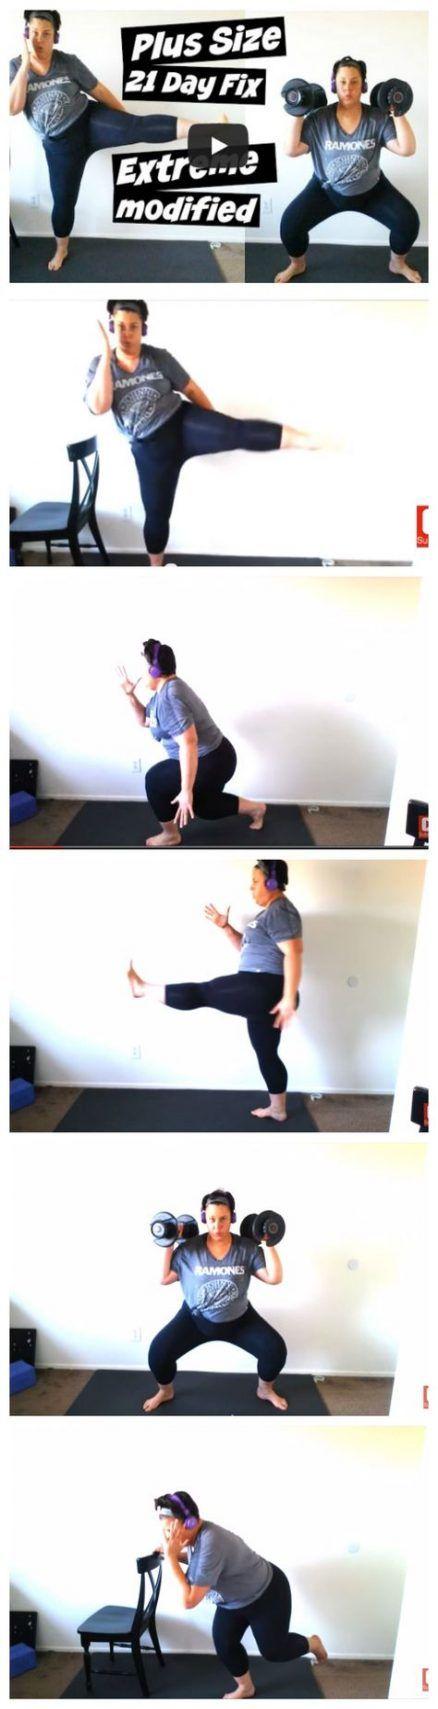 New fitness motivacin plus size exercise 29+ ideas #fitness